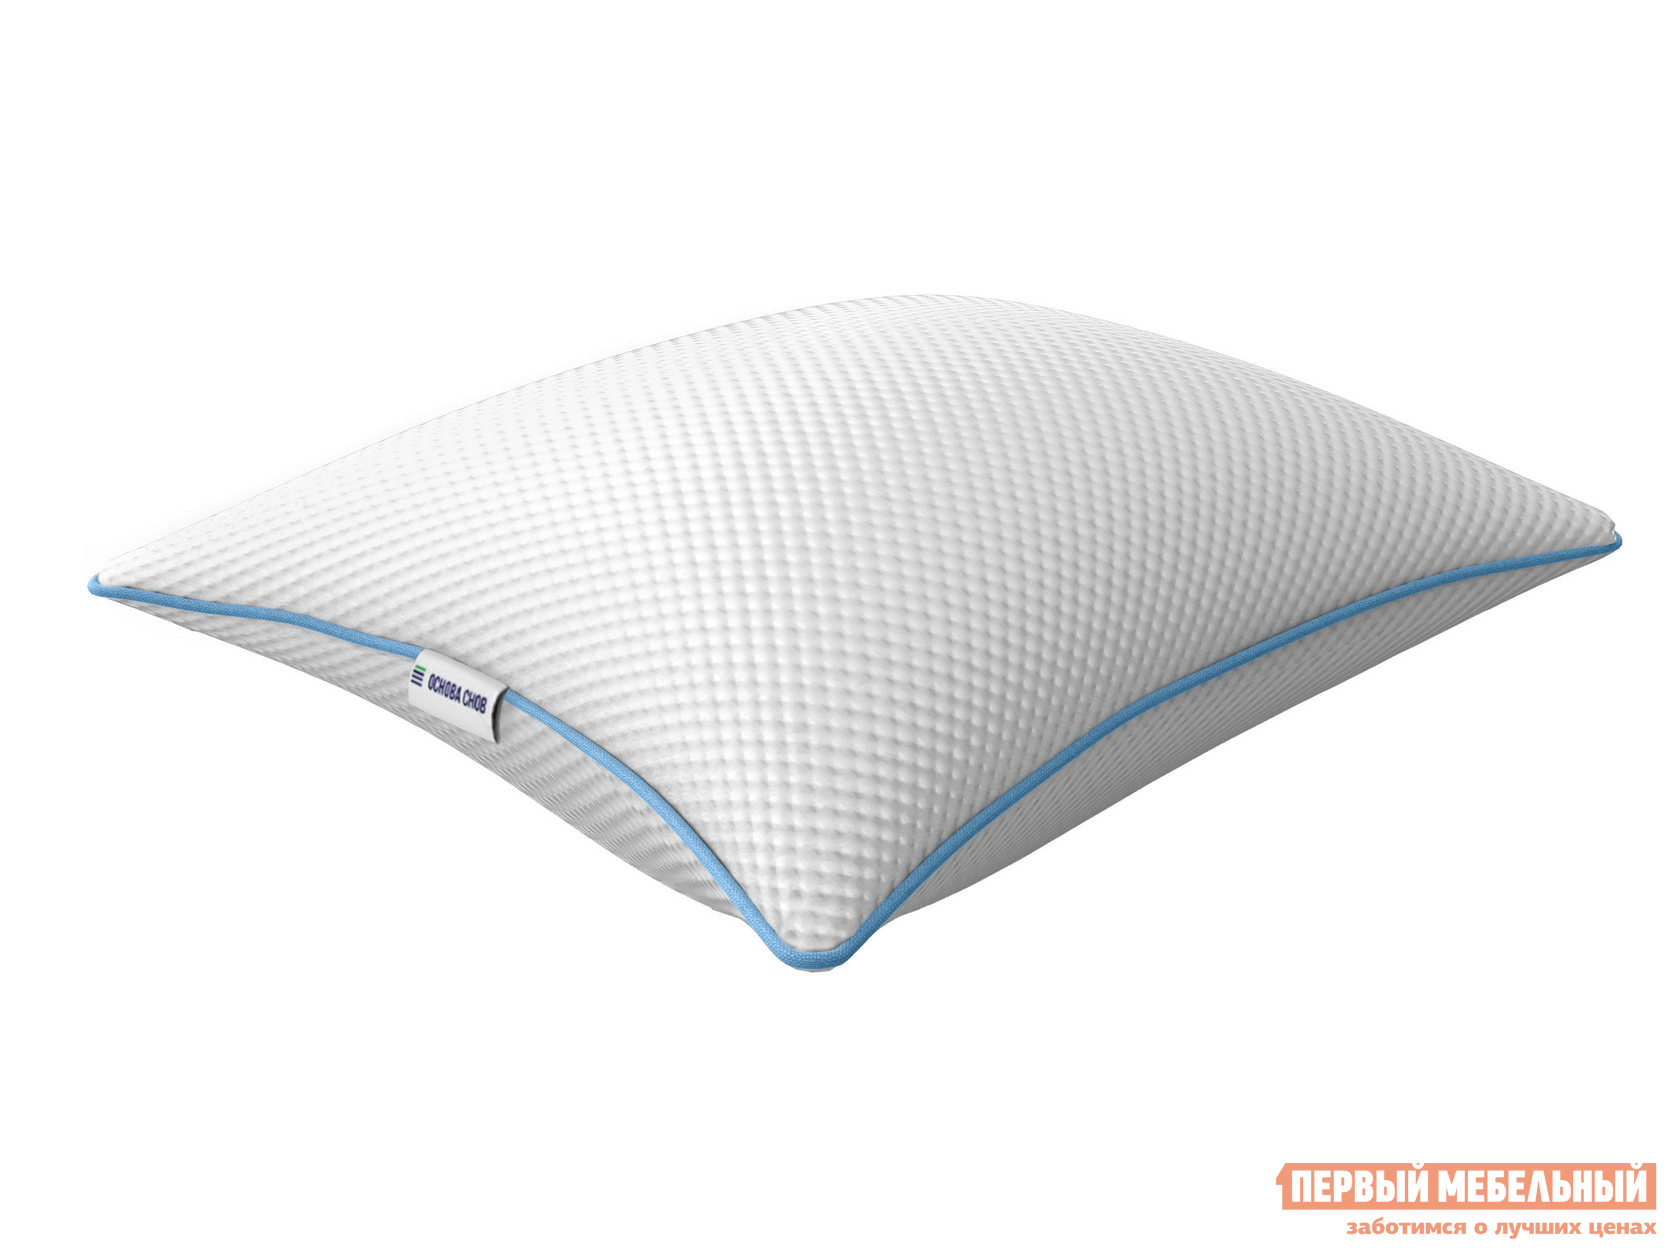 Подушка Подушка Comfort Белый фото